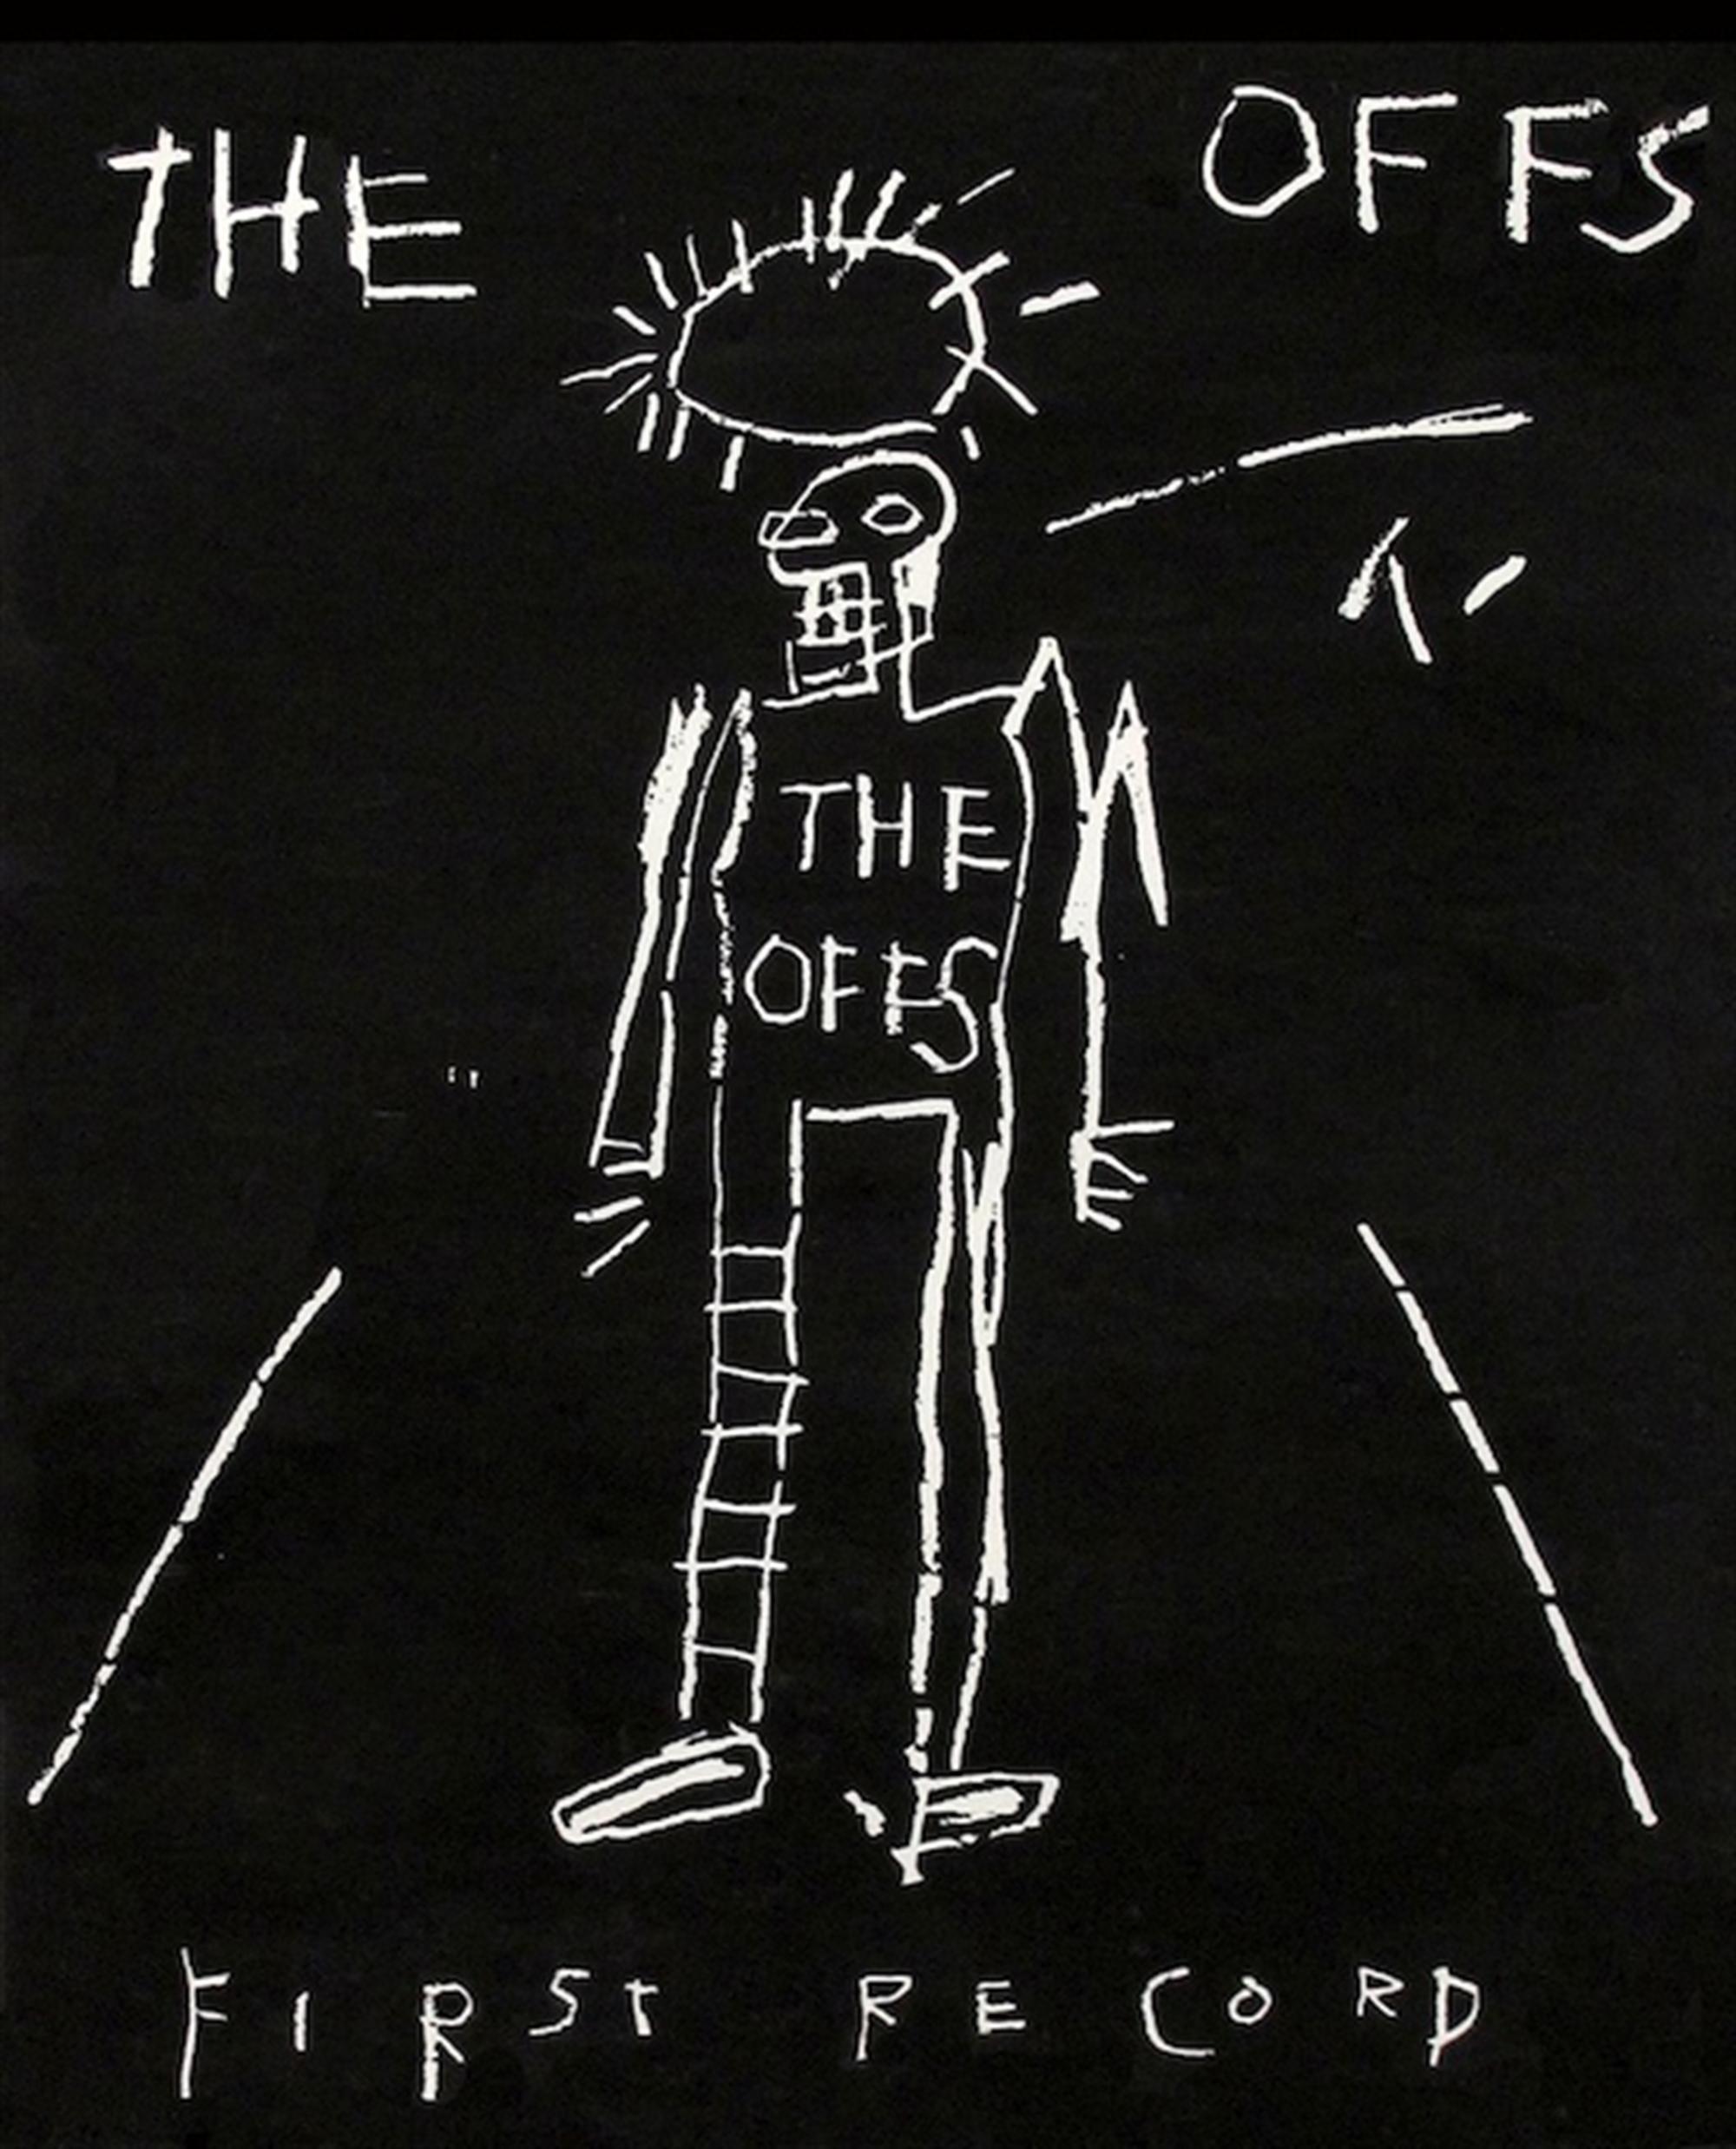 The Offs by Jean-Michel Basquiat